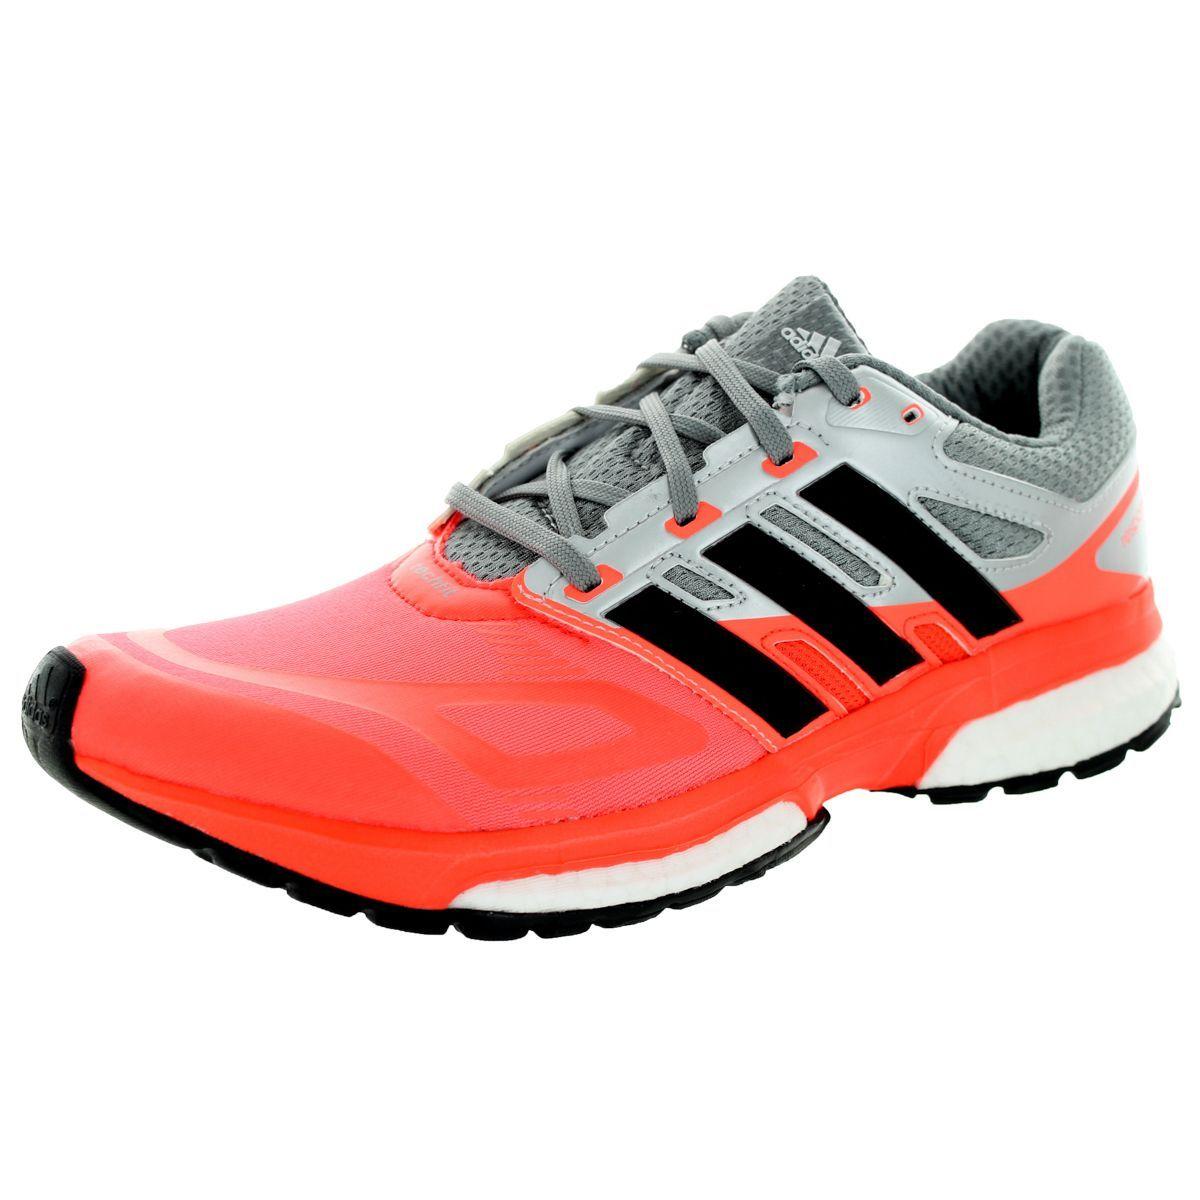 e9e06fe8c17 Adidas Men s Response Boost Techfit M  Grey Running Shoe